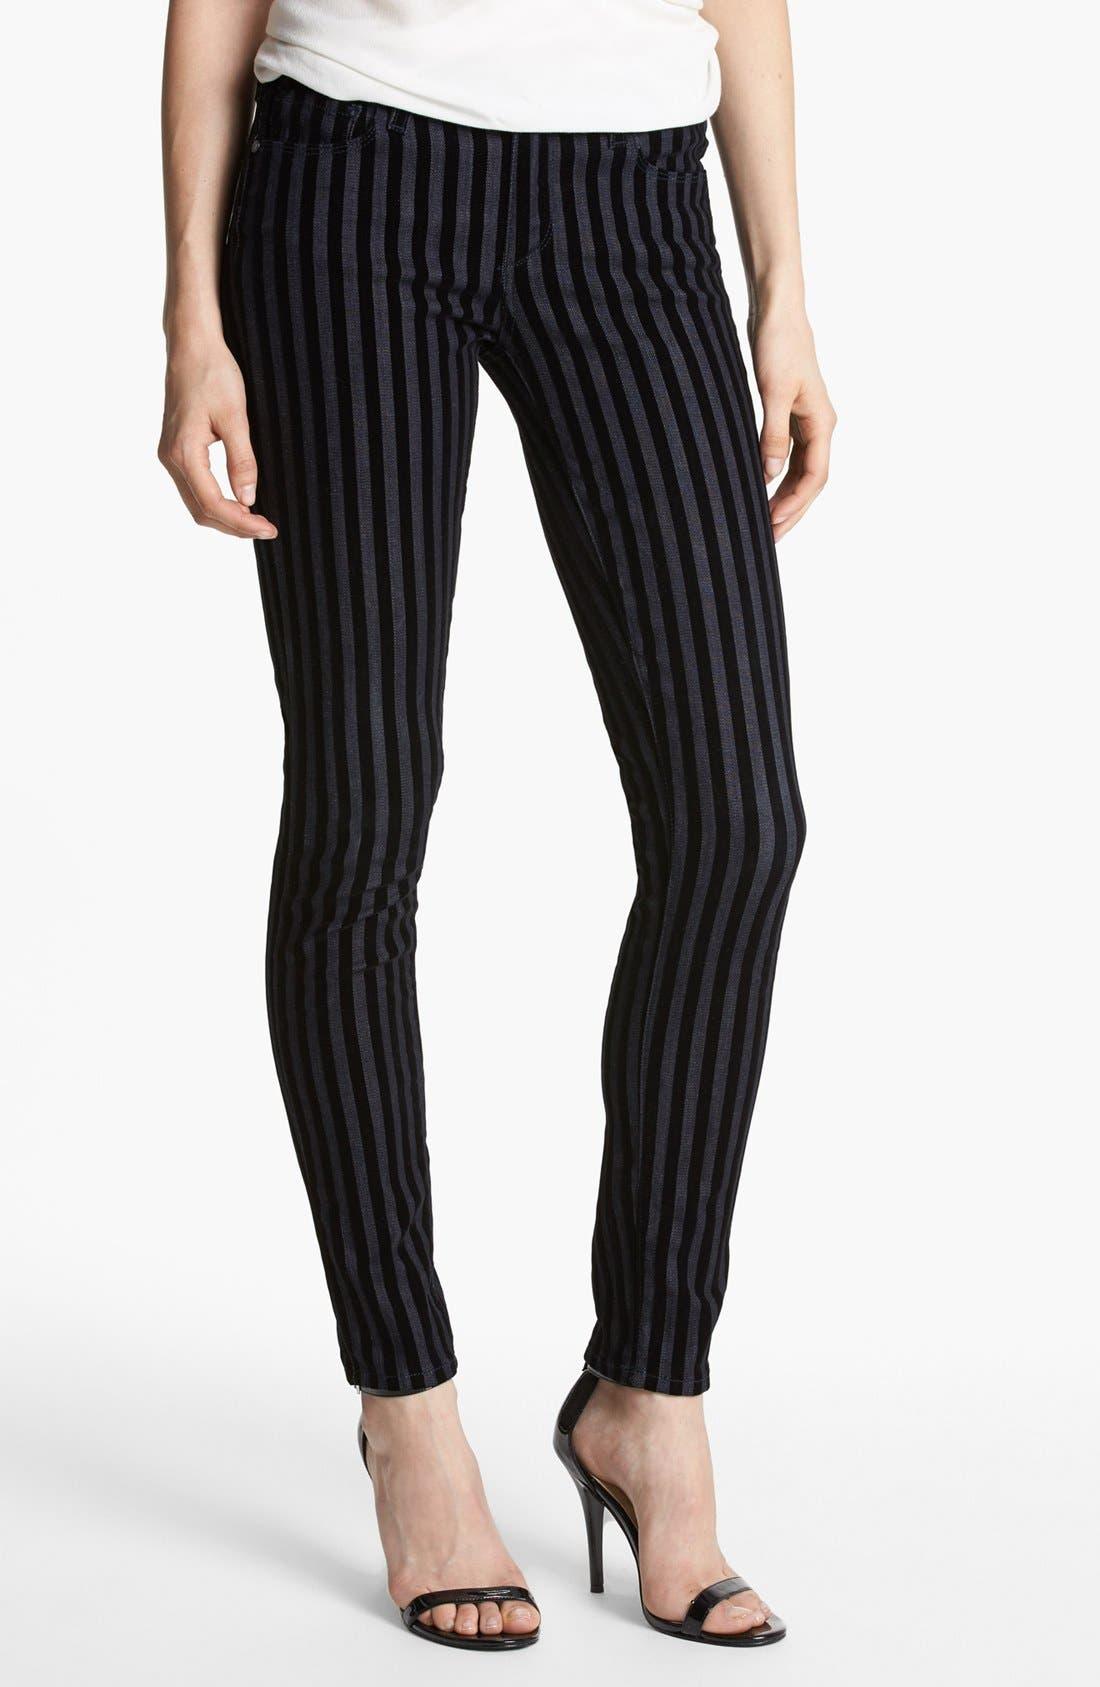 Alternate Image 1 Selected - Paige Denim Flocked Skinny Jeans (Flocked Stripe)